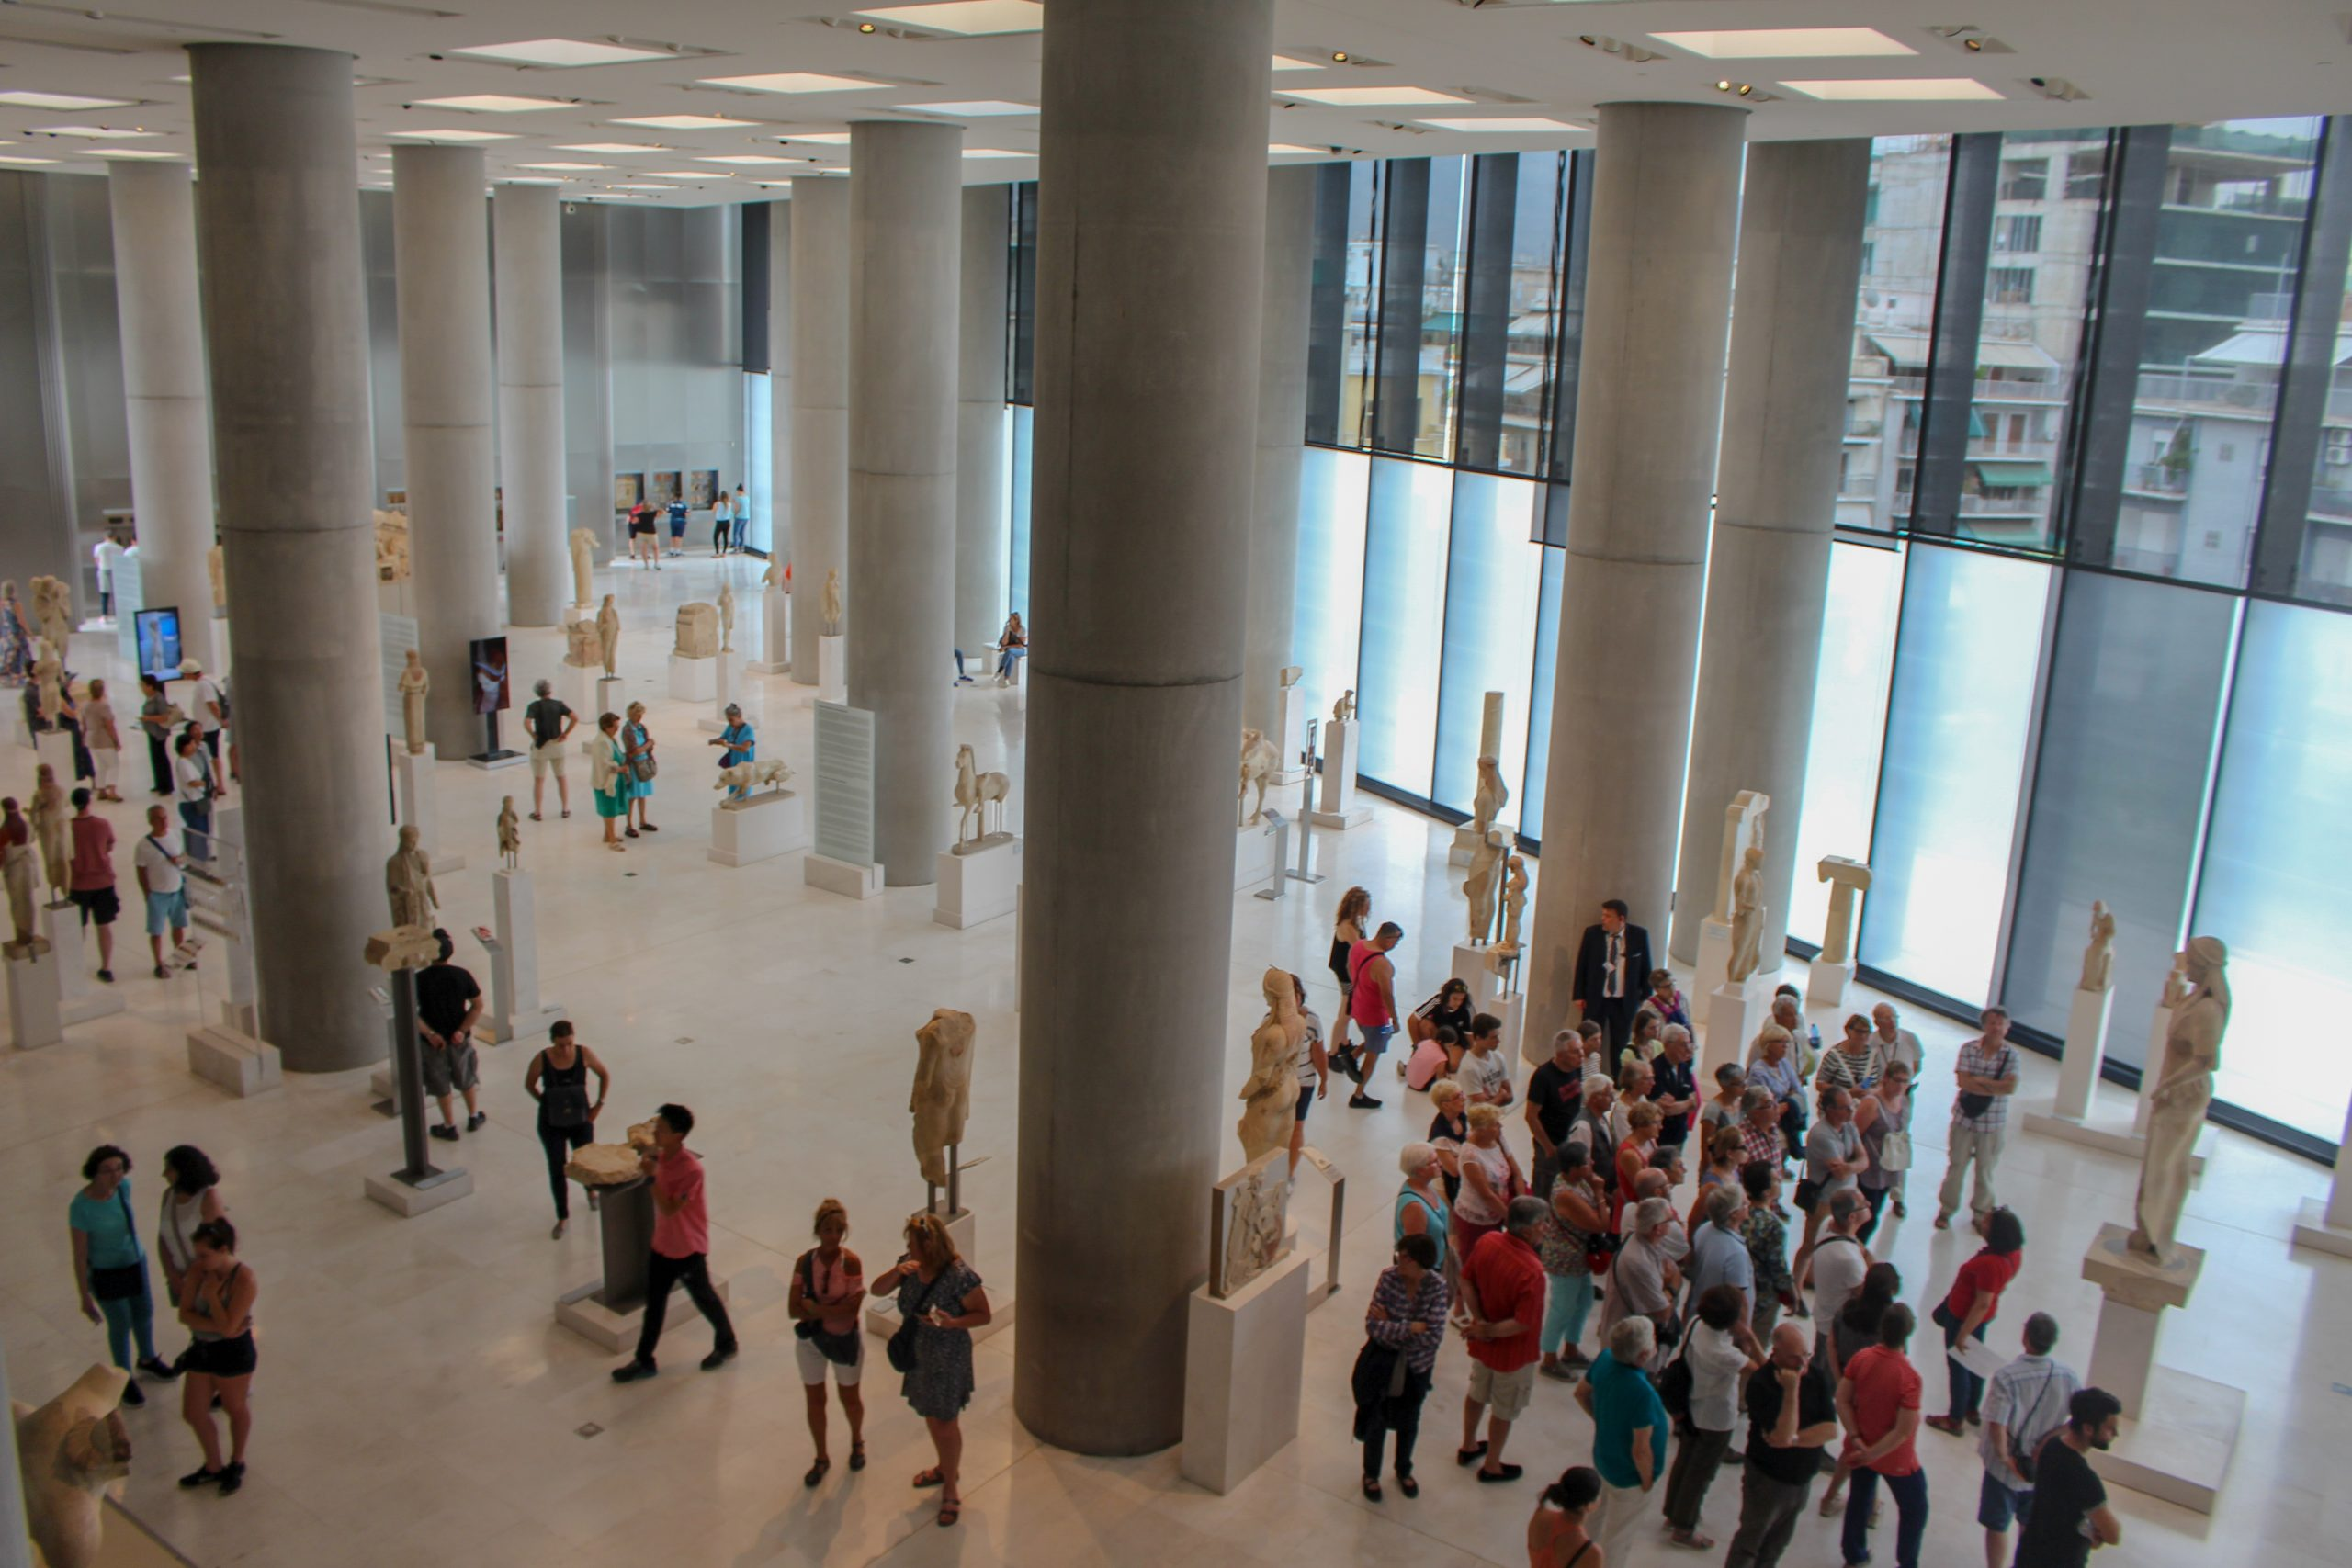 museu_da_acropole_interior